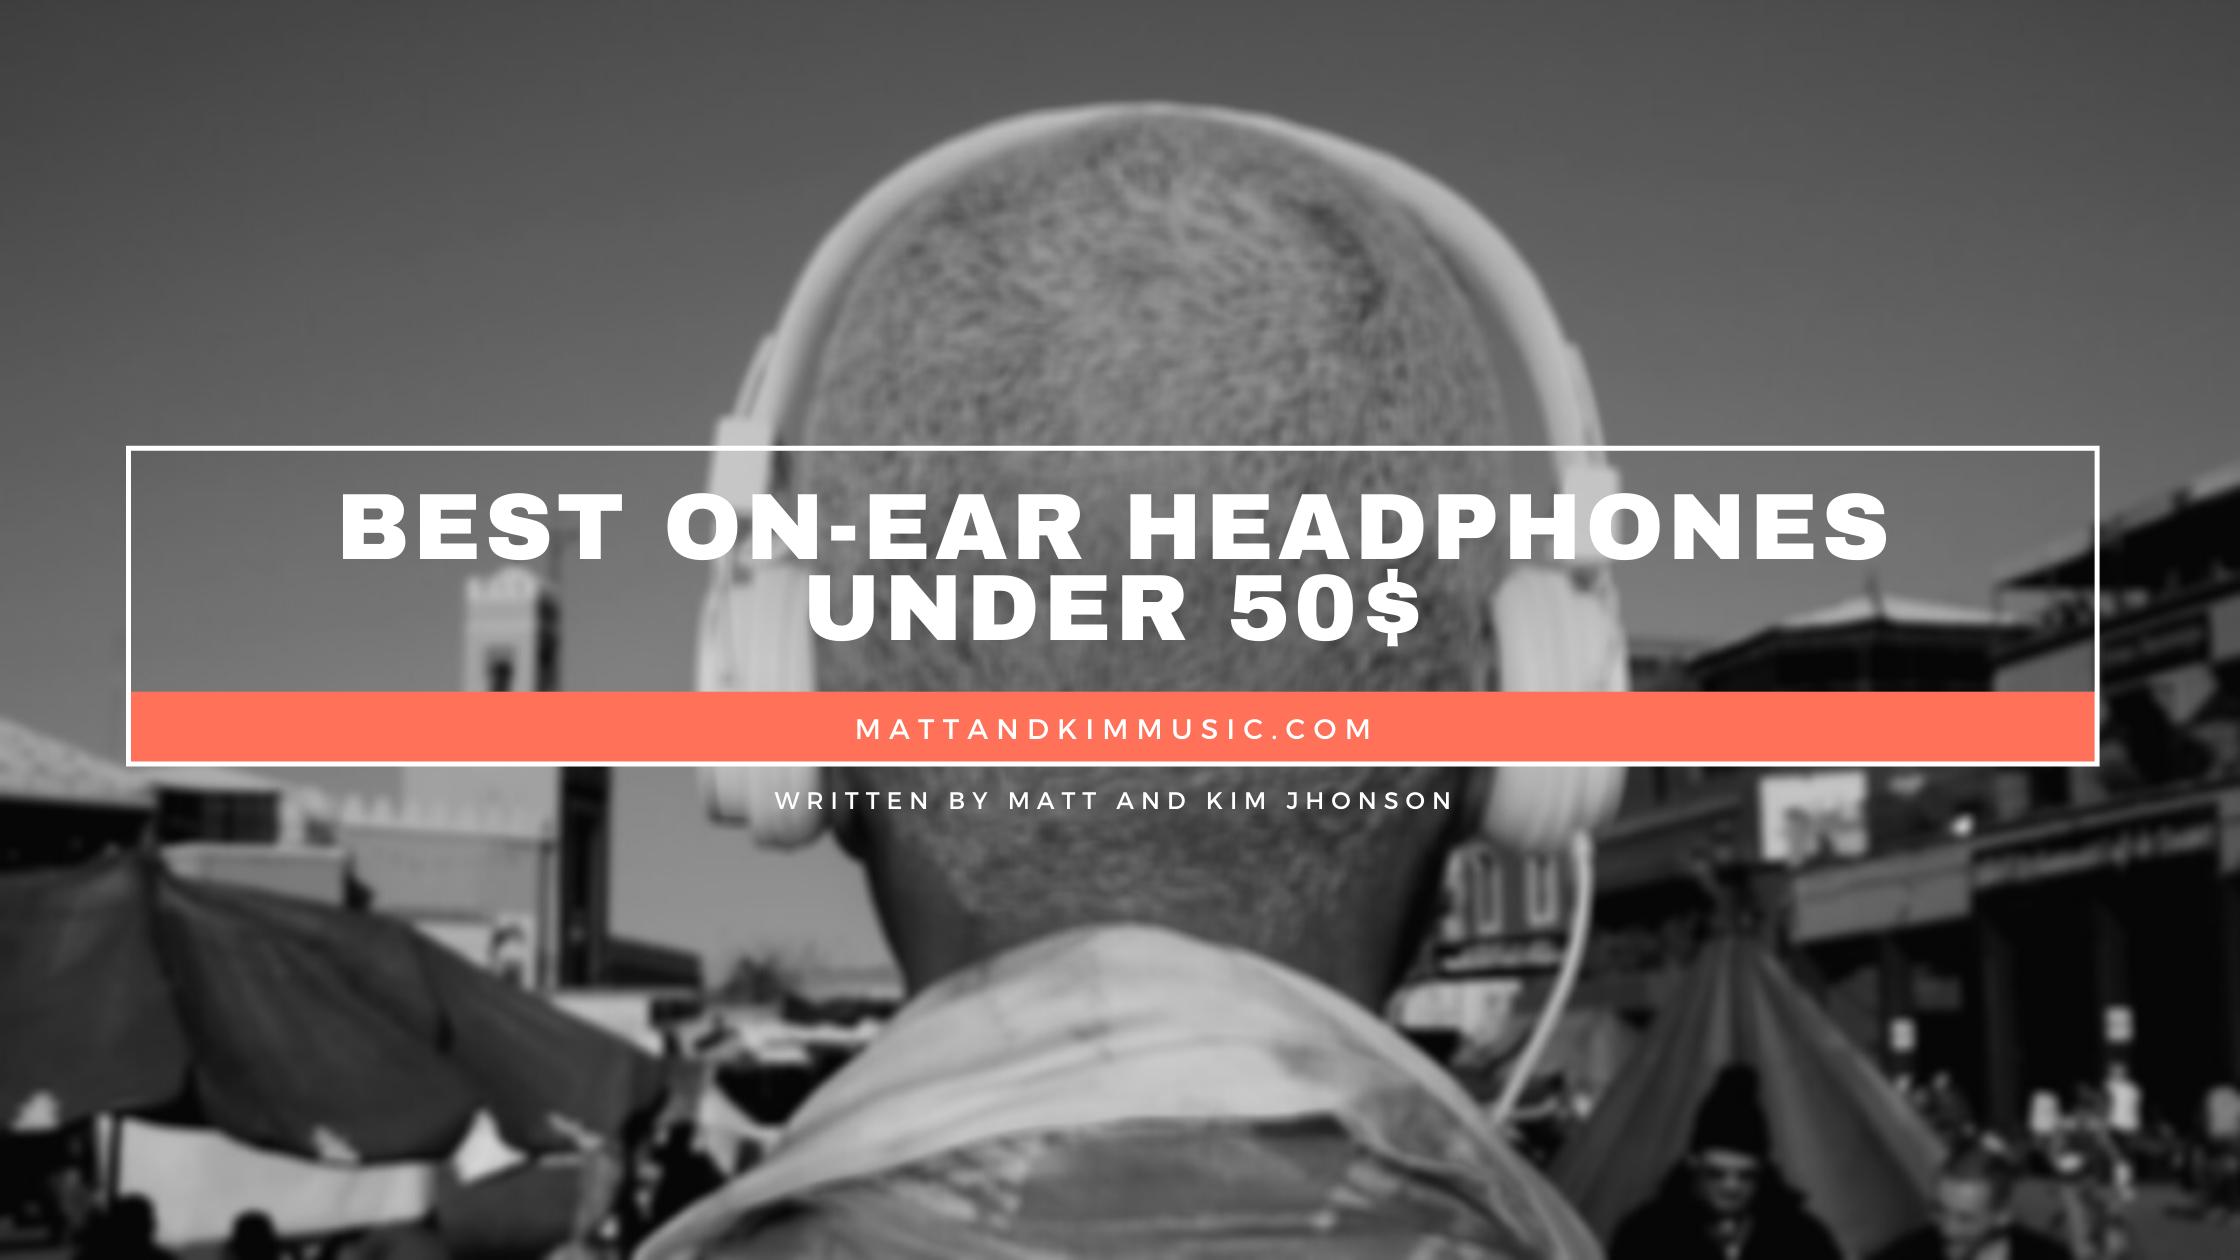 best on-ear headphones under 50